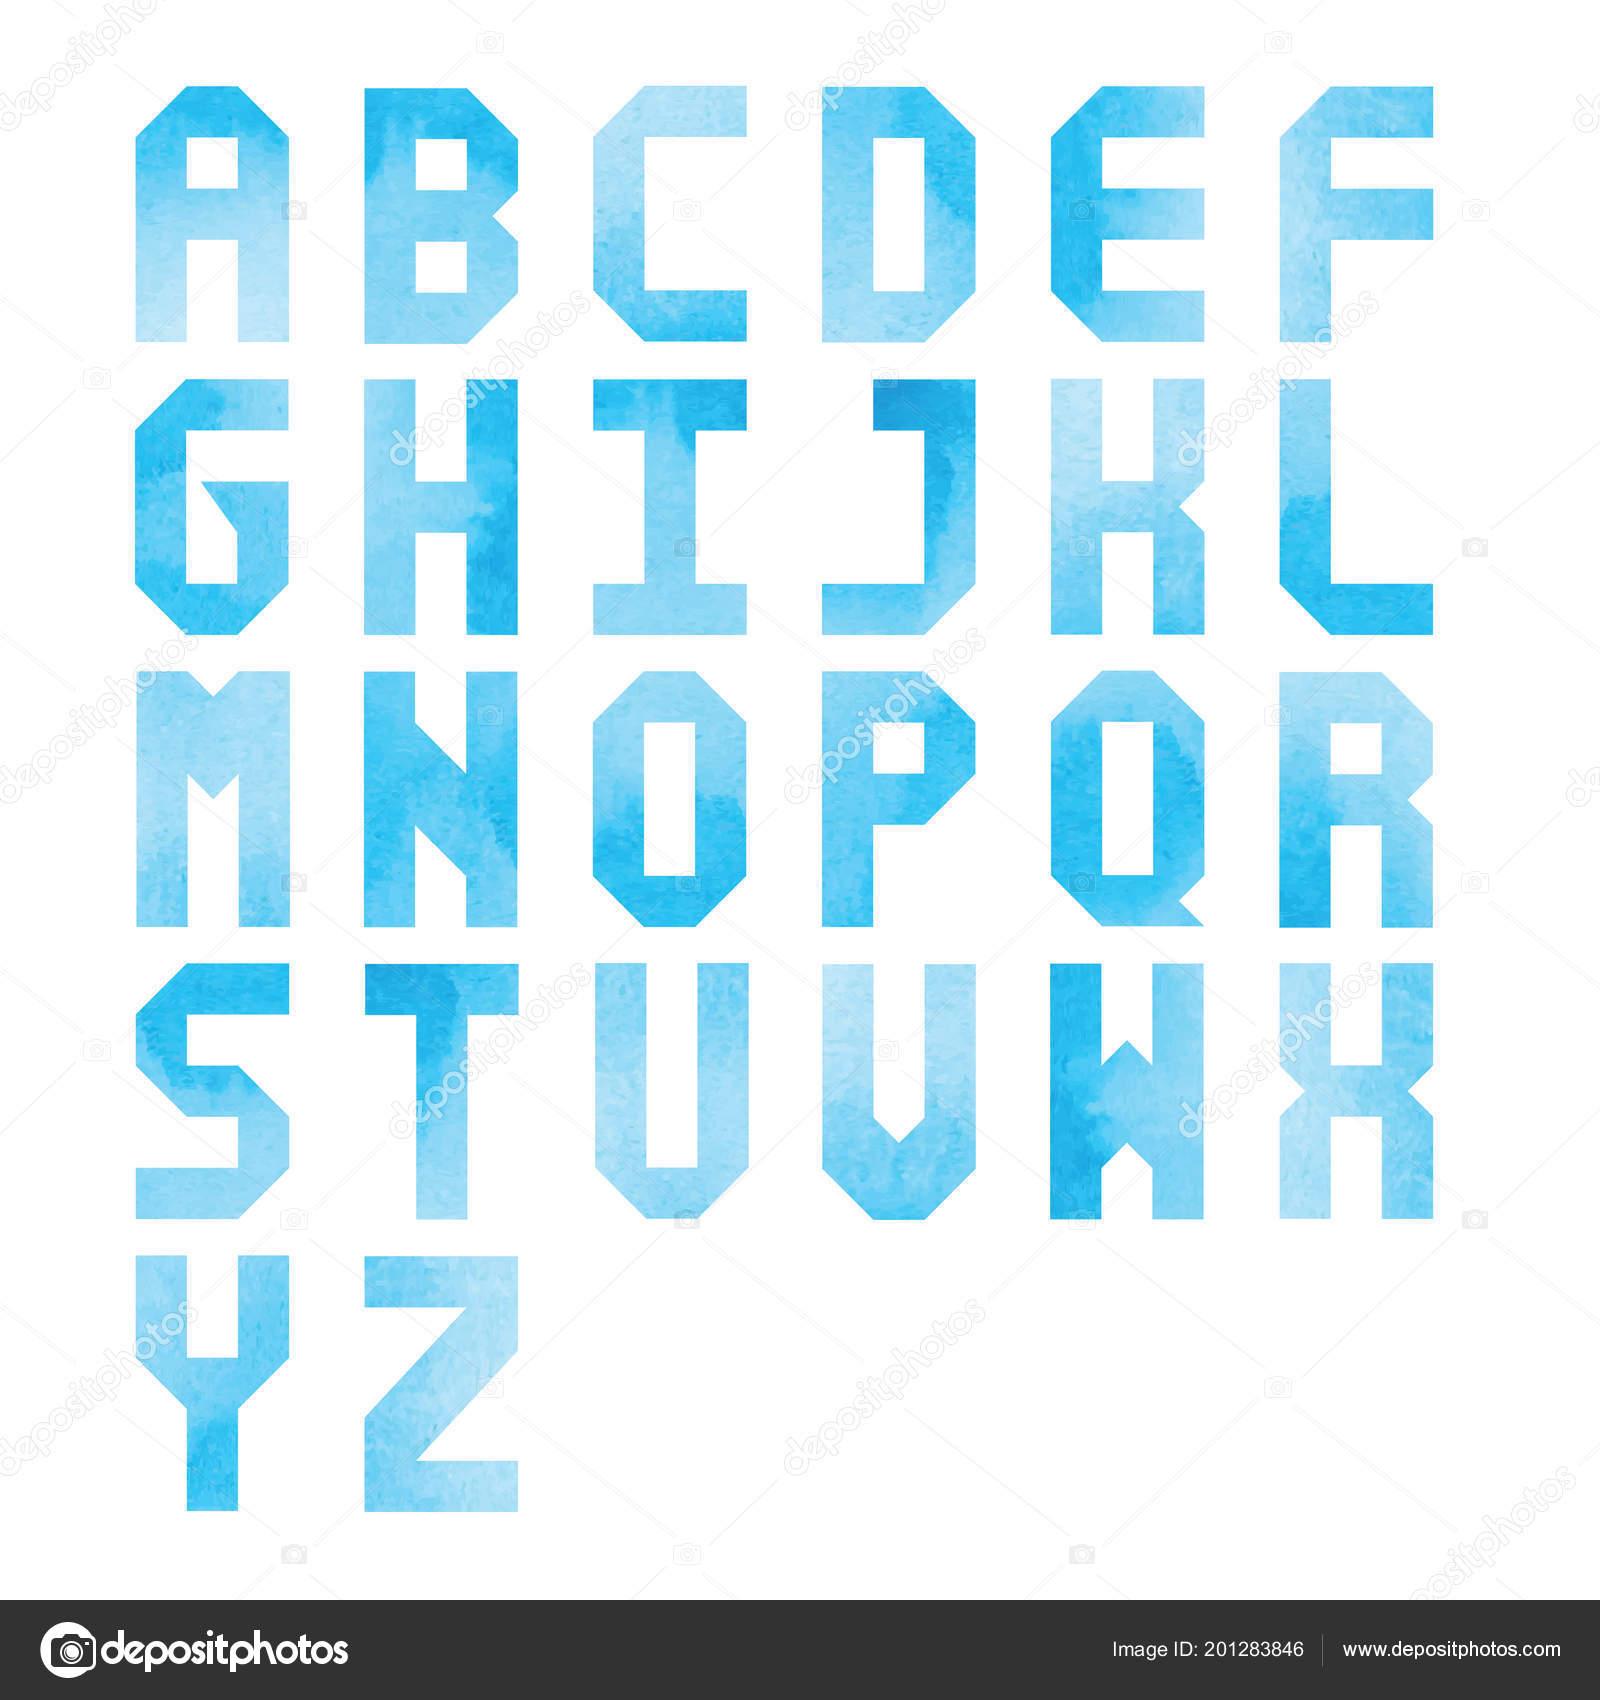 Blue Watercolor Alphabet White Background Design — Stock Vector